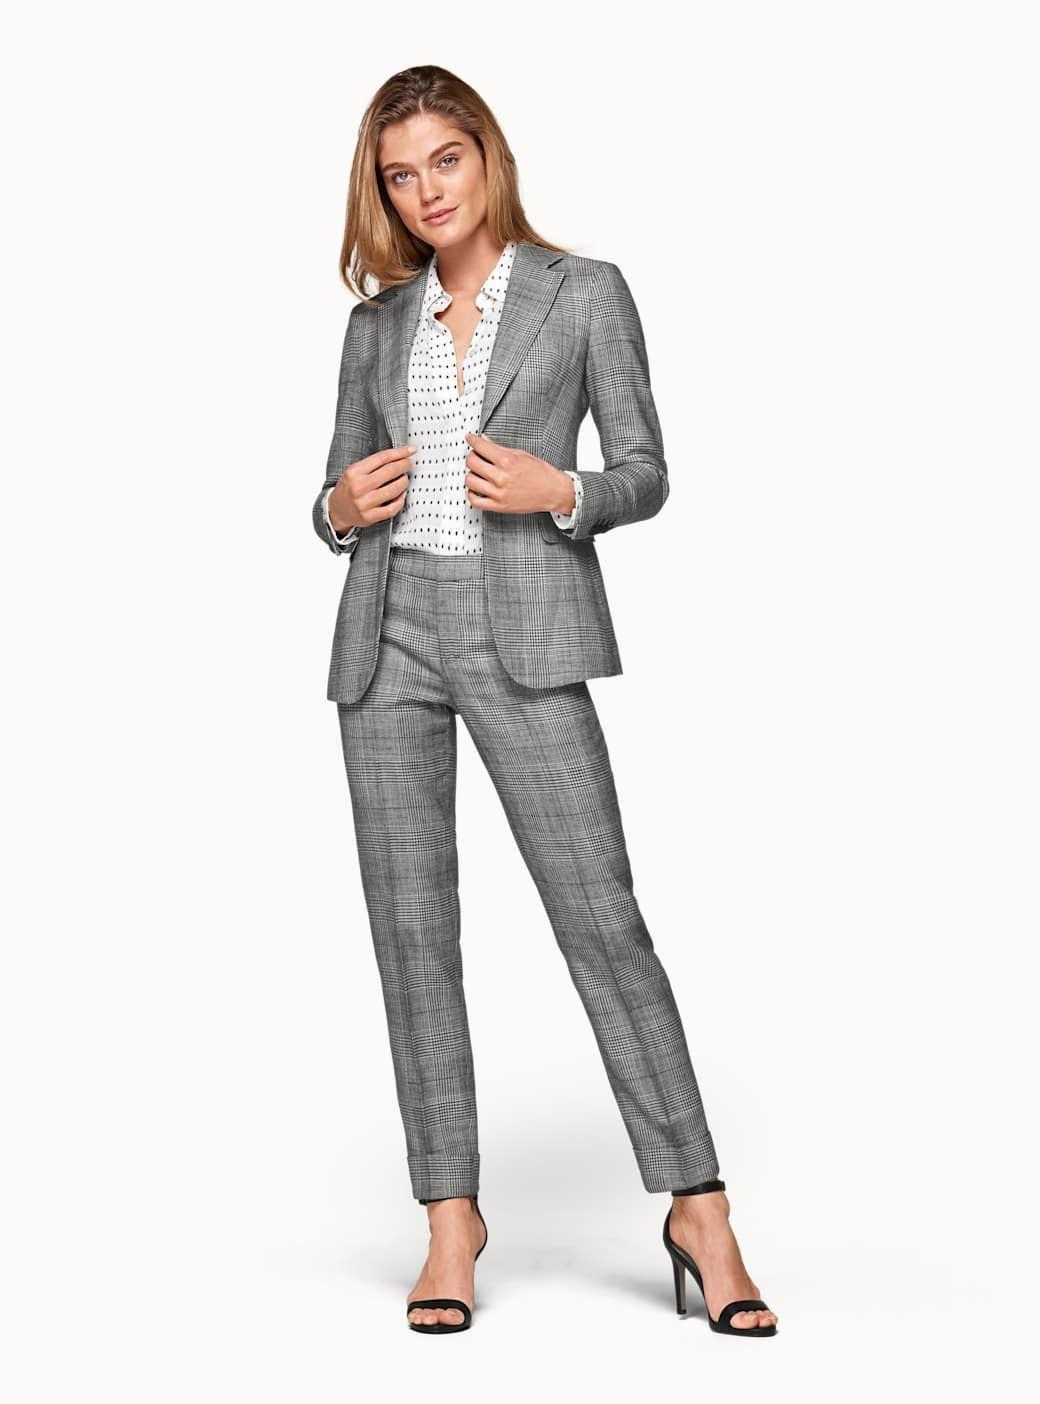 2018 New Online Cheap Visit New Cameron Grey Suit Suistudio Official Site Cheap Sale Pay With Visa Cheap Online 0MqEn2